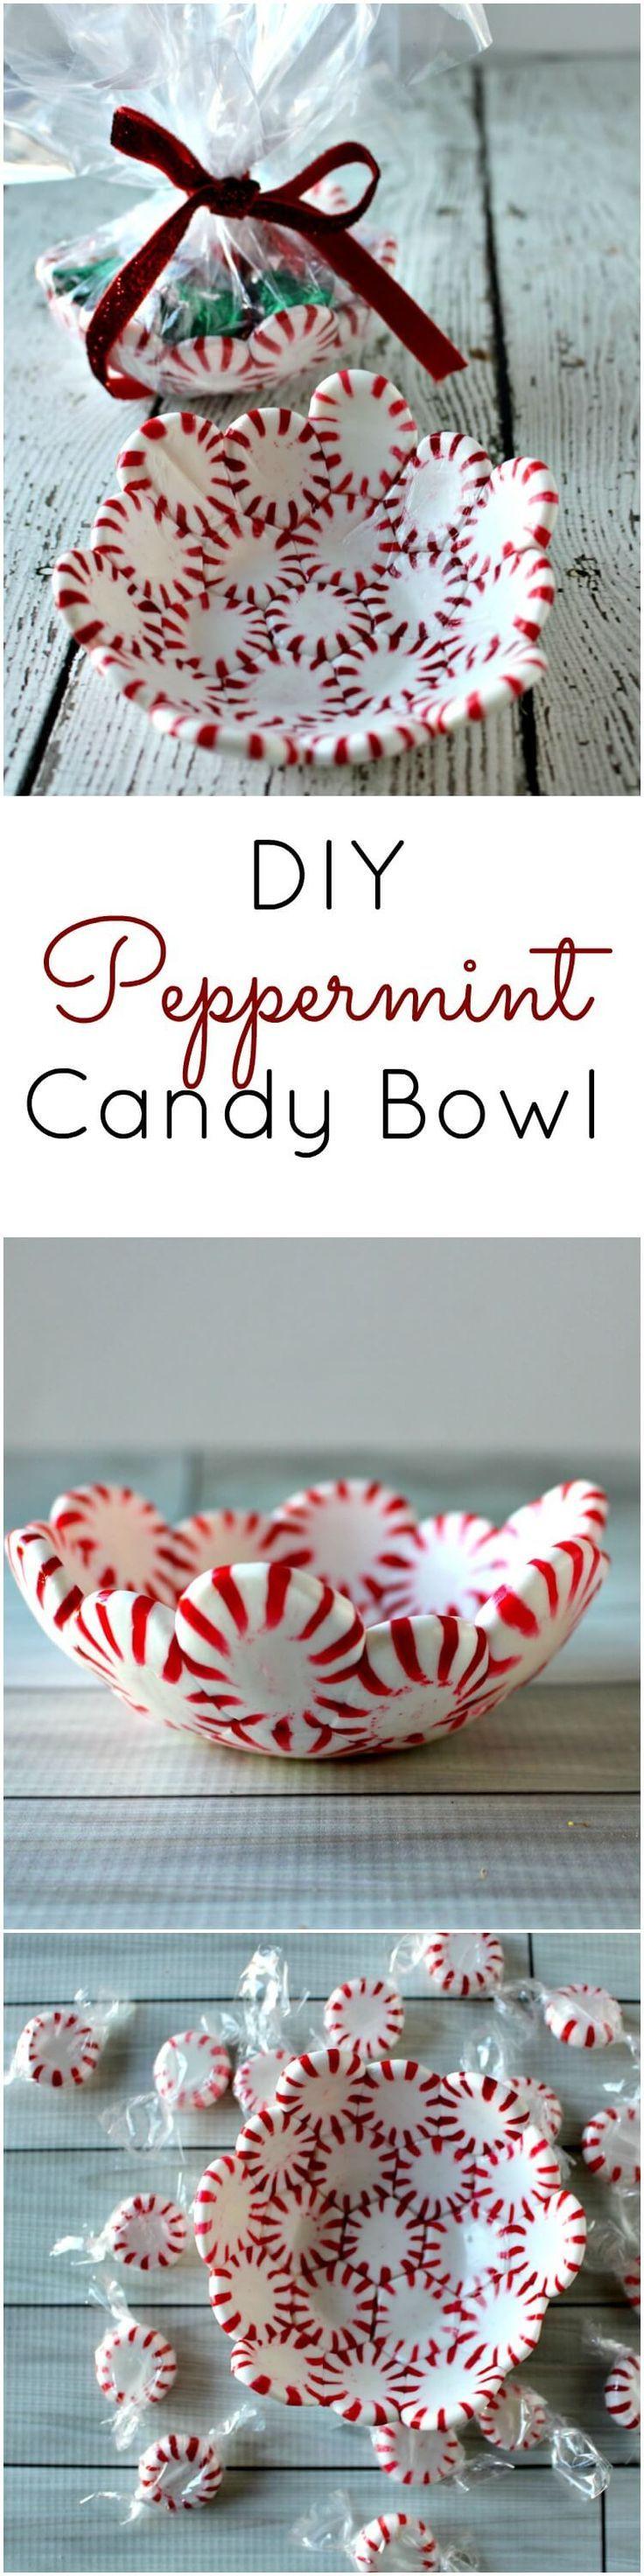 diy peppermint candy bowl